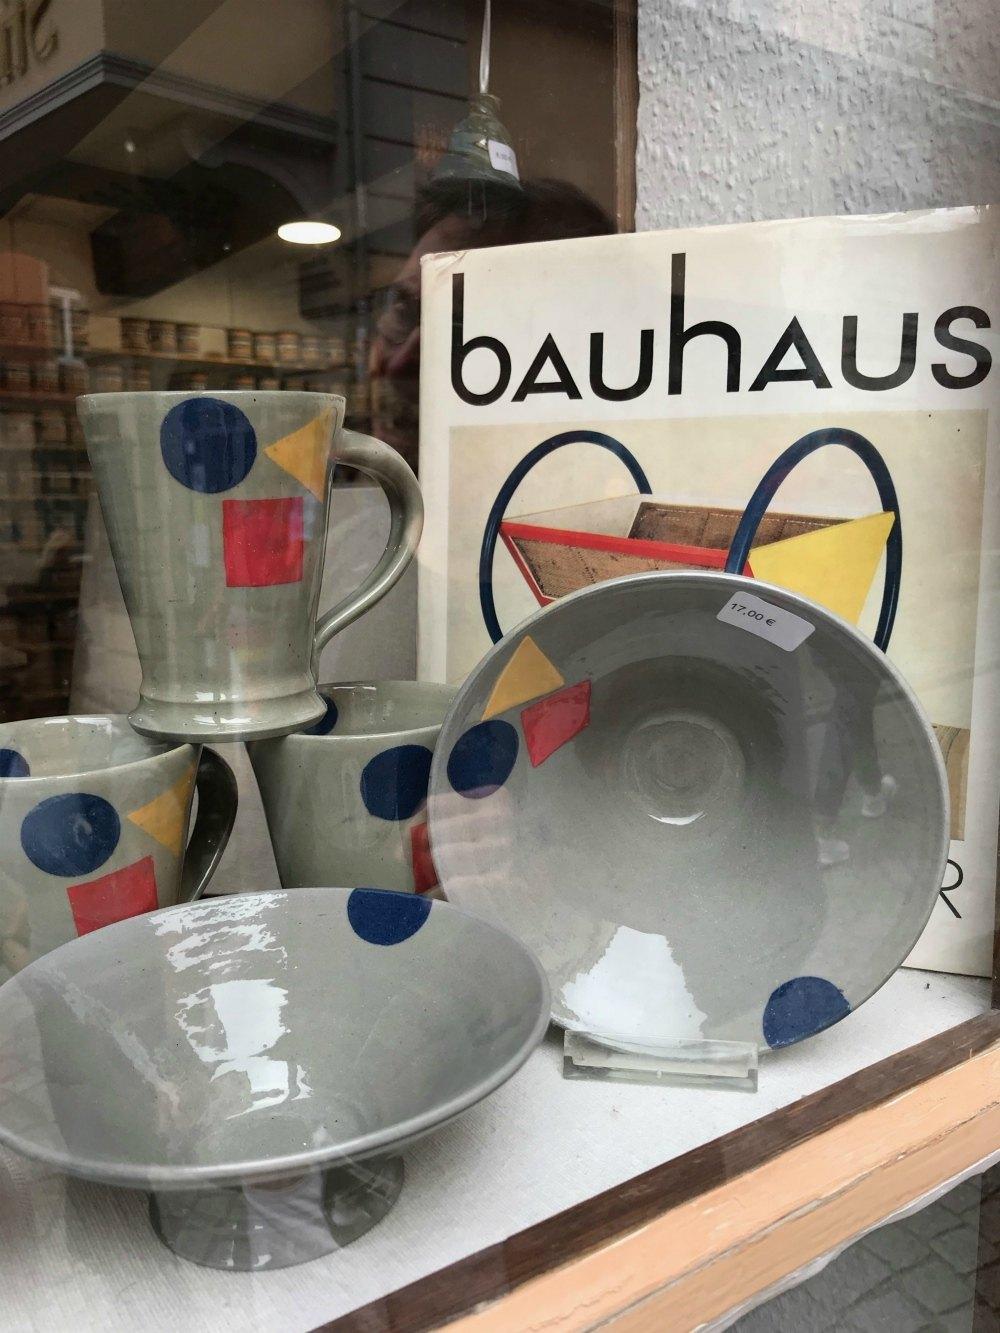 Bauhaus pottery in Erfurt, Thuringia, Germany Photo Heatheronhertravels.com